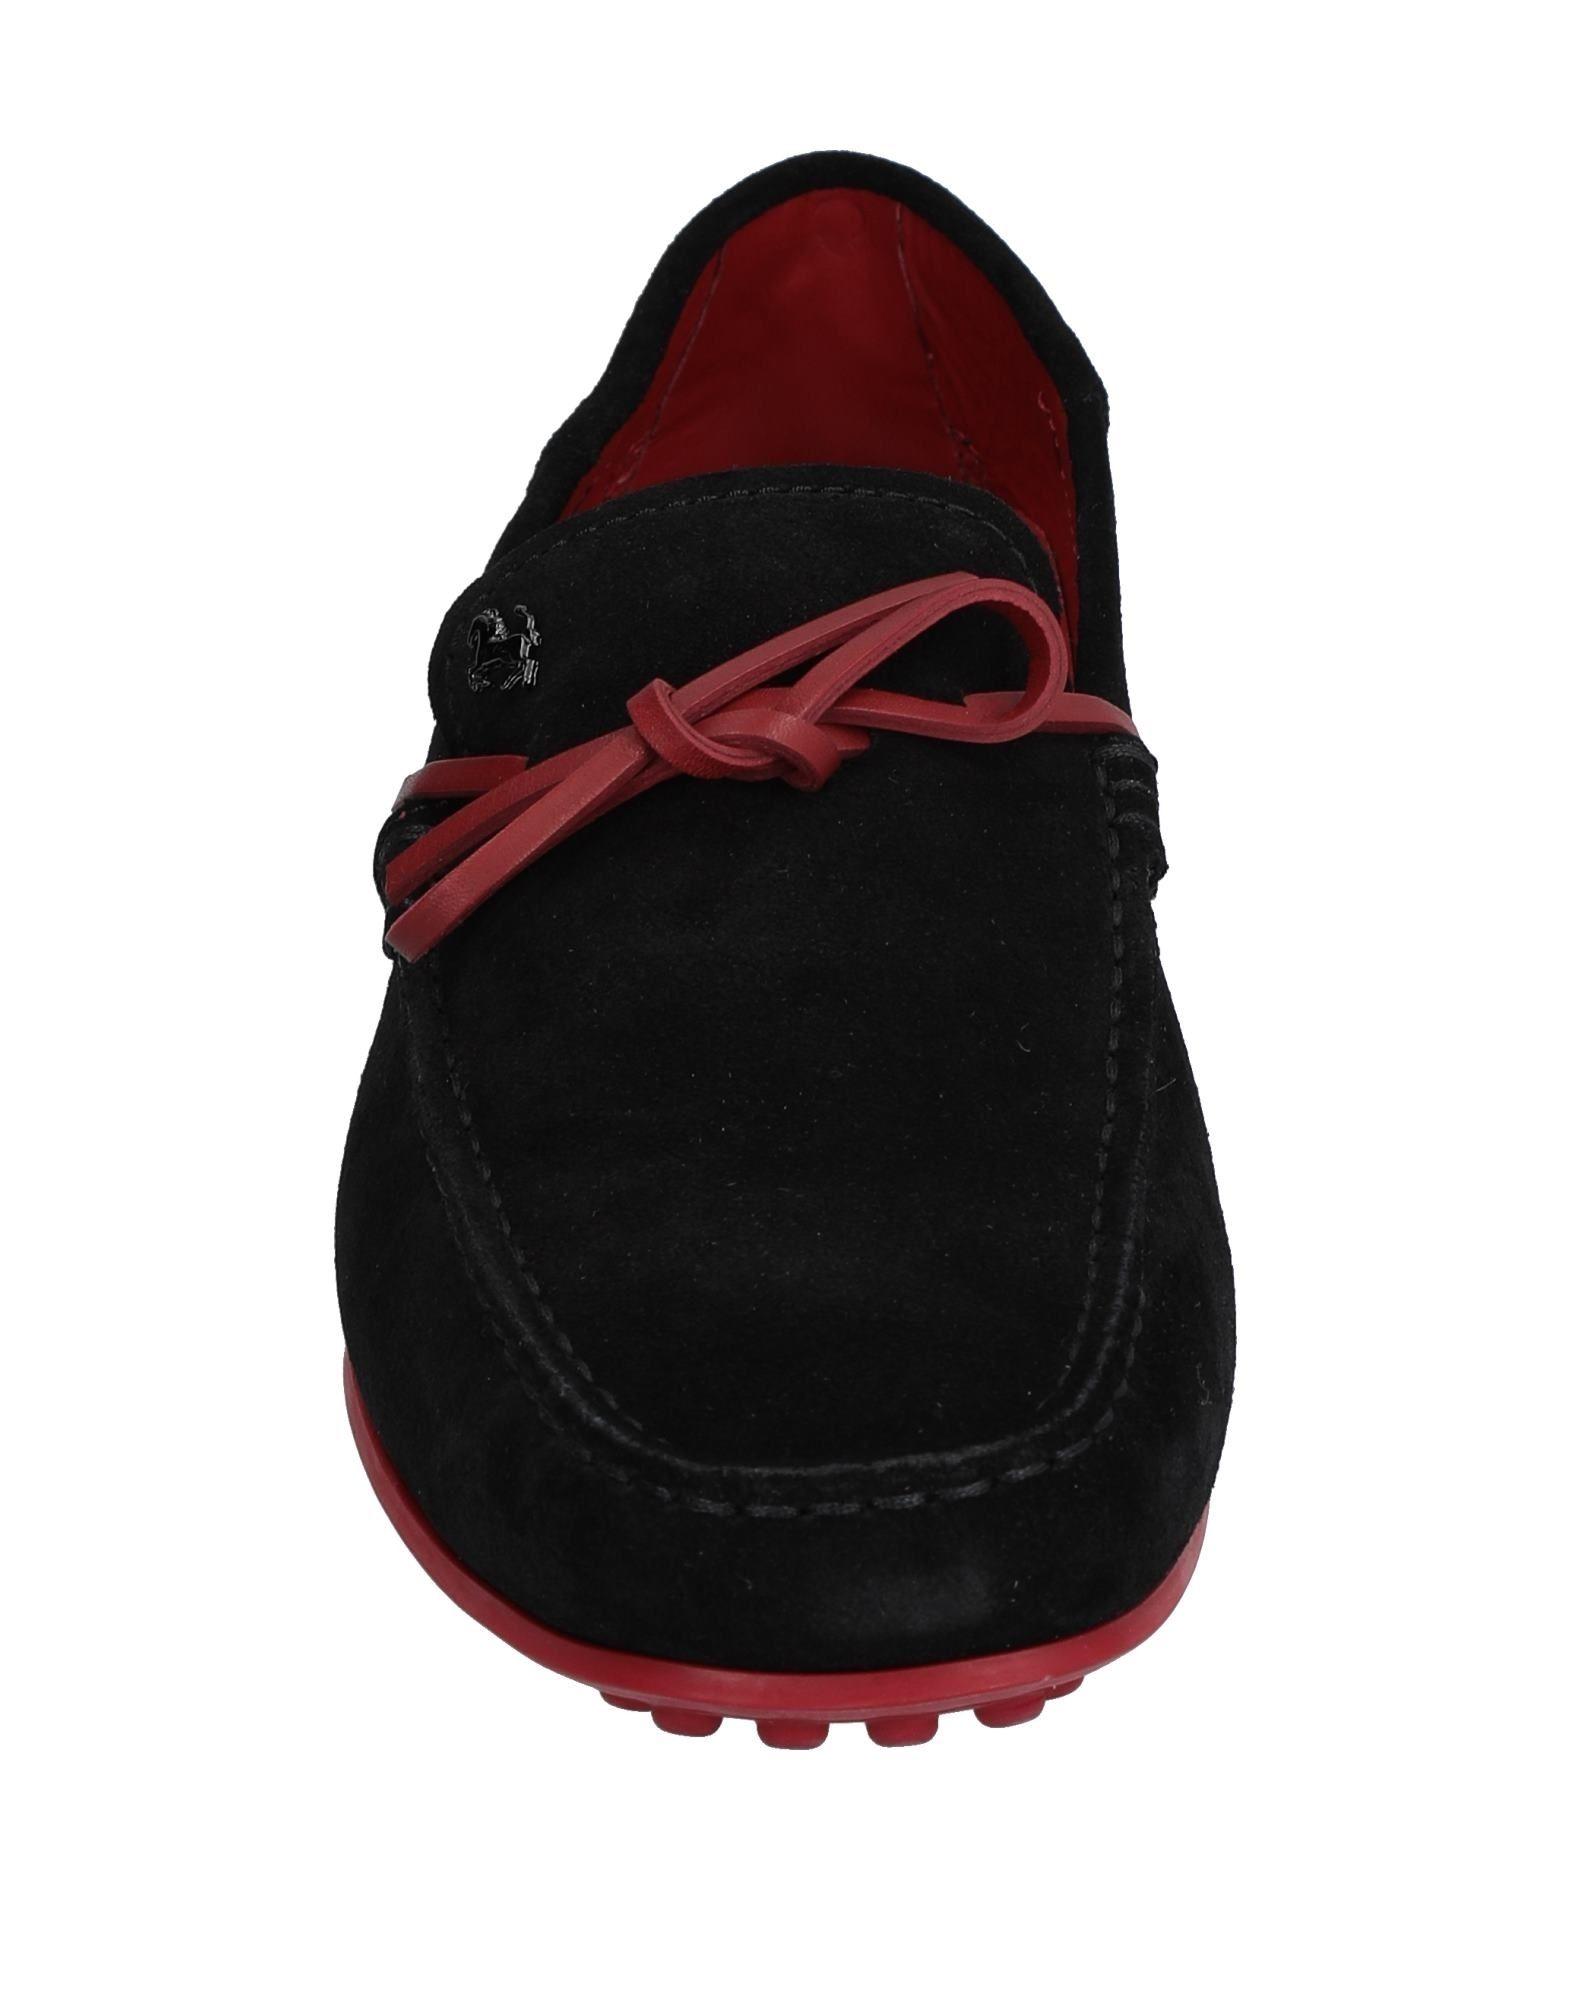 Tod's For Ferrari Mokassins Herren  11541318RT Gute Qualität beliebte Schuhe